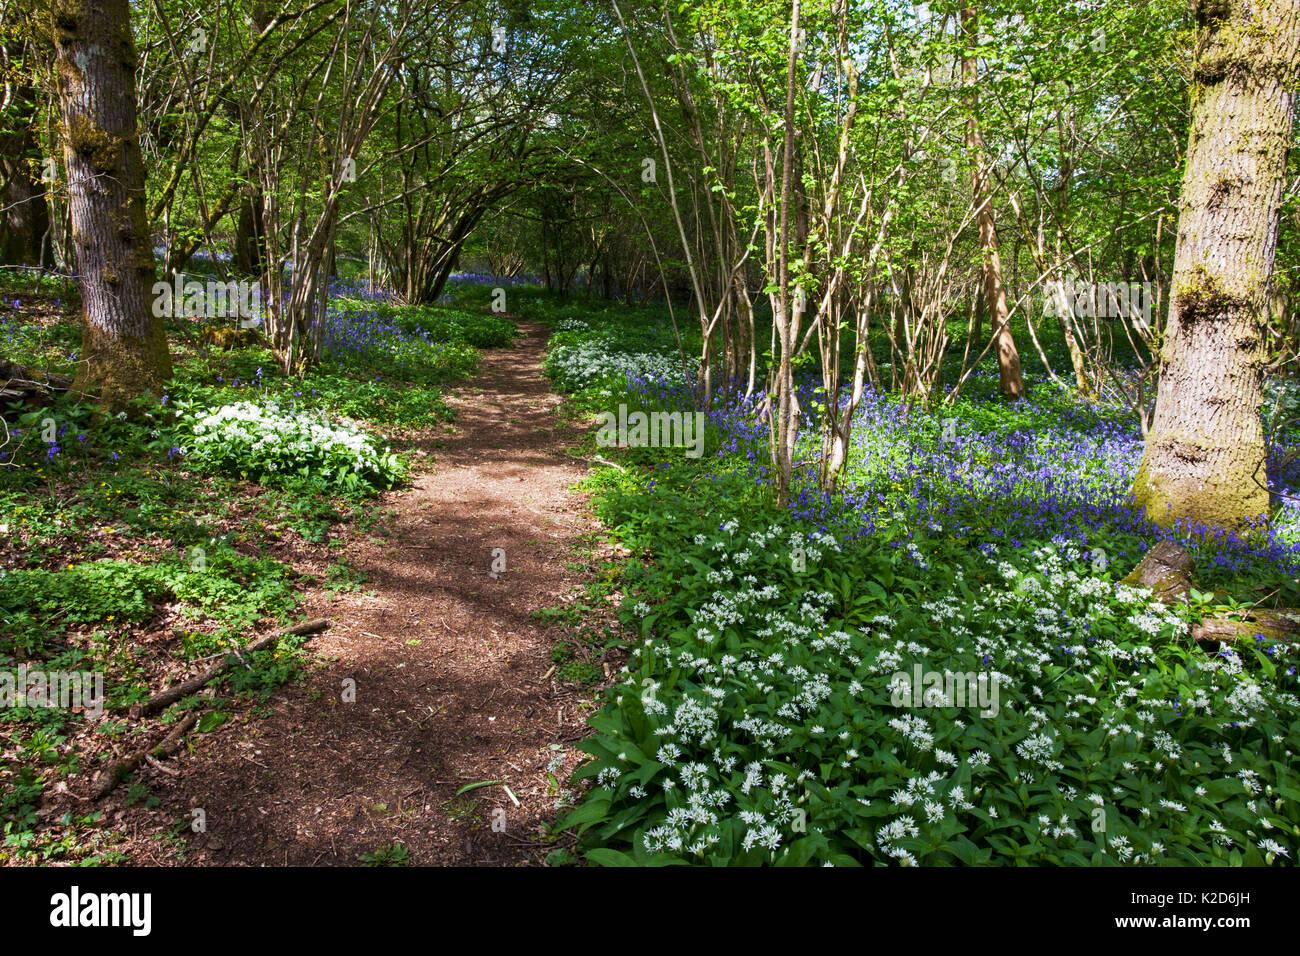 Footpath through Garston Wood RSPB reserve with Bluebell (Hyacinthoides non-scripta) and Ramsons (Allium ursinum) near Shaftesbury, Dorset, UK May - Stock Image